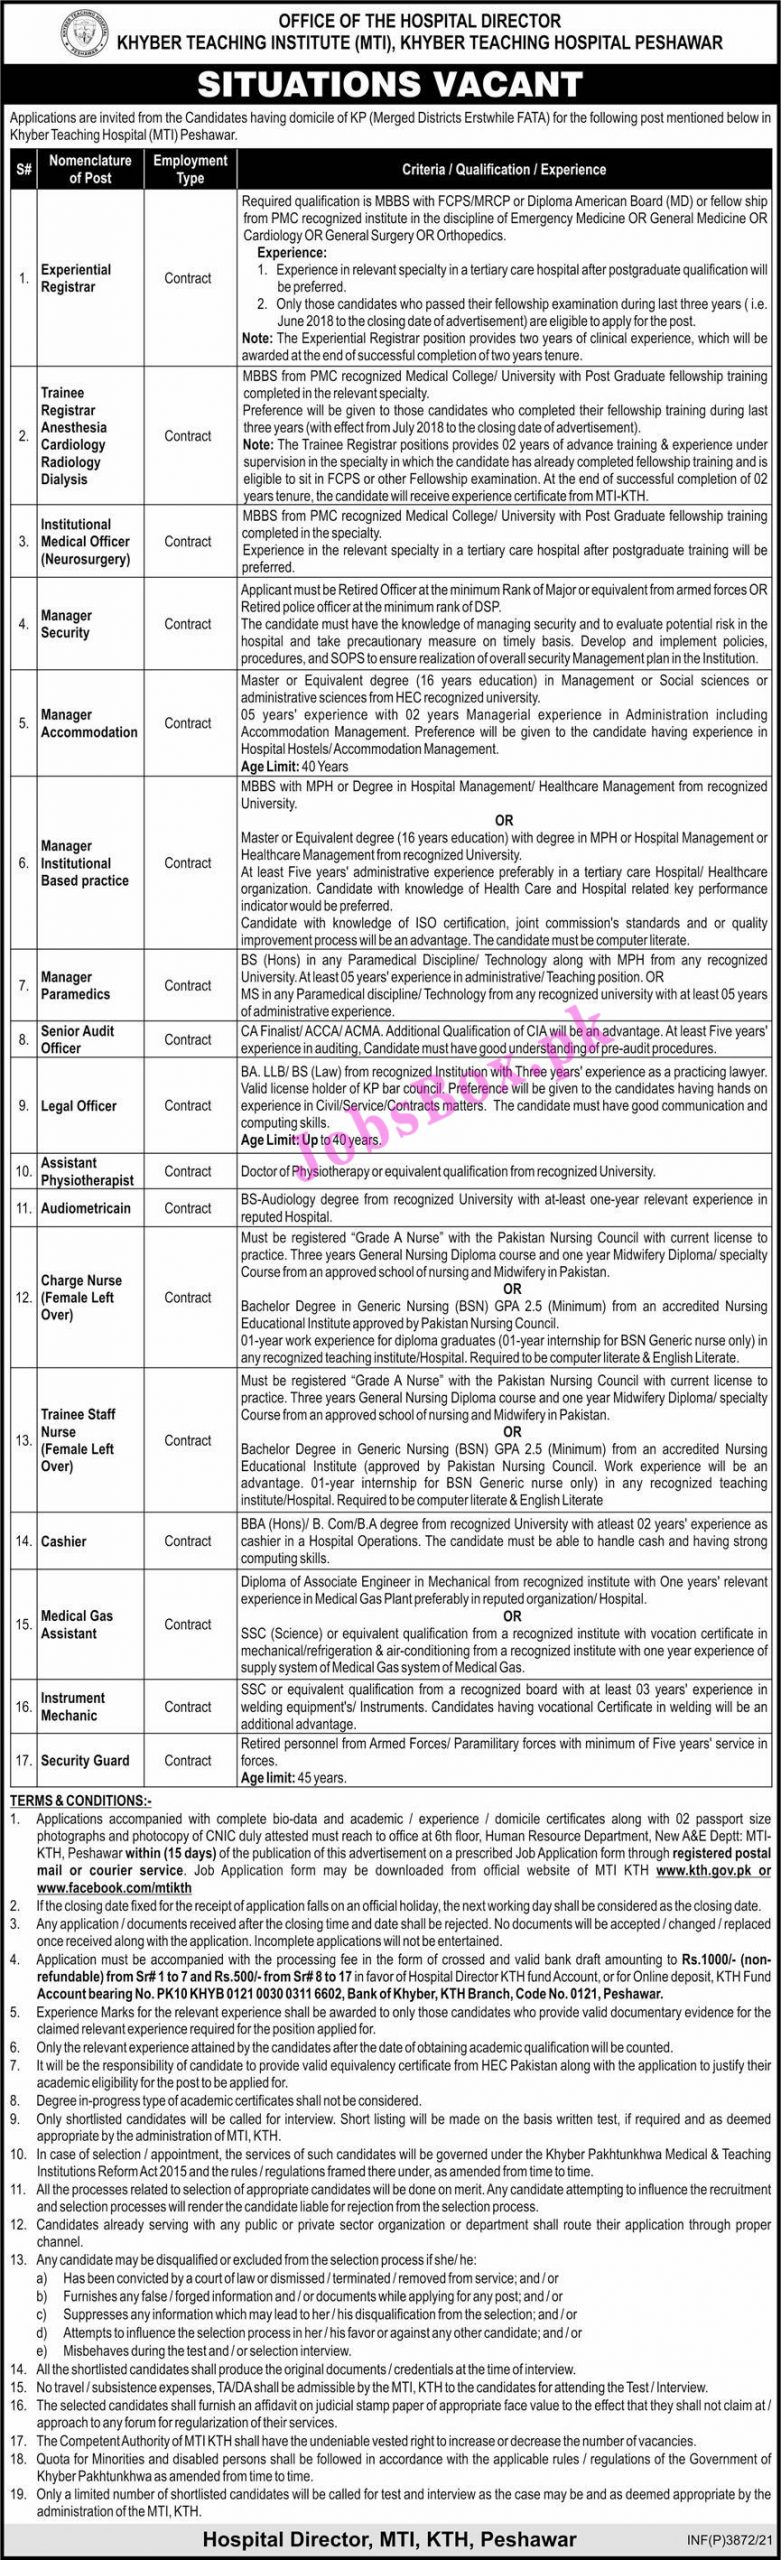 www.kth.gov.pk Jobs 2021 - KTH Khyber Teaching Hospital Jobs 2021 in Pakistan